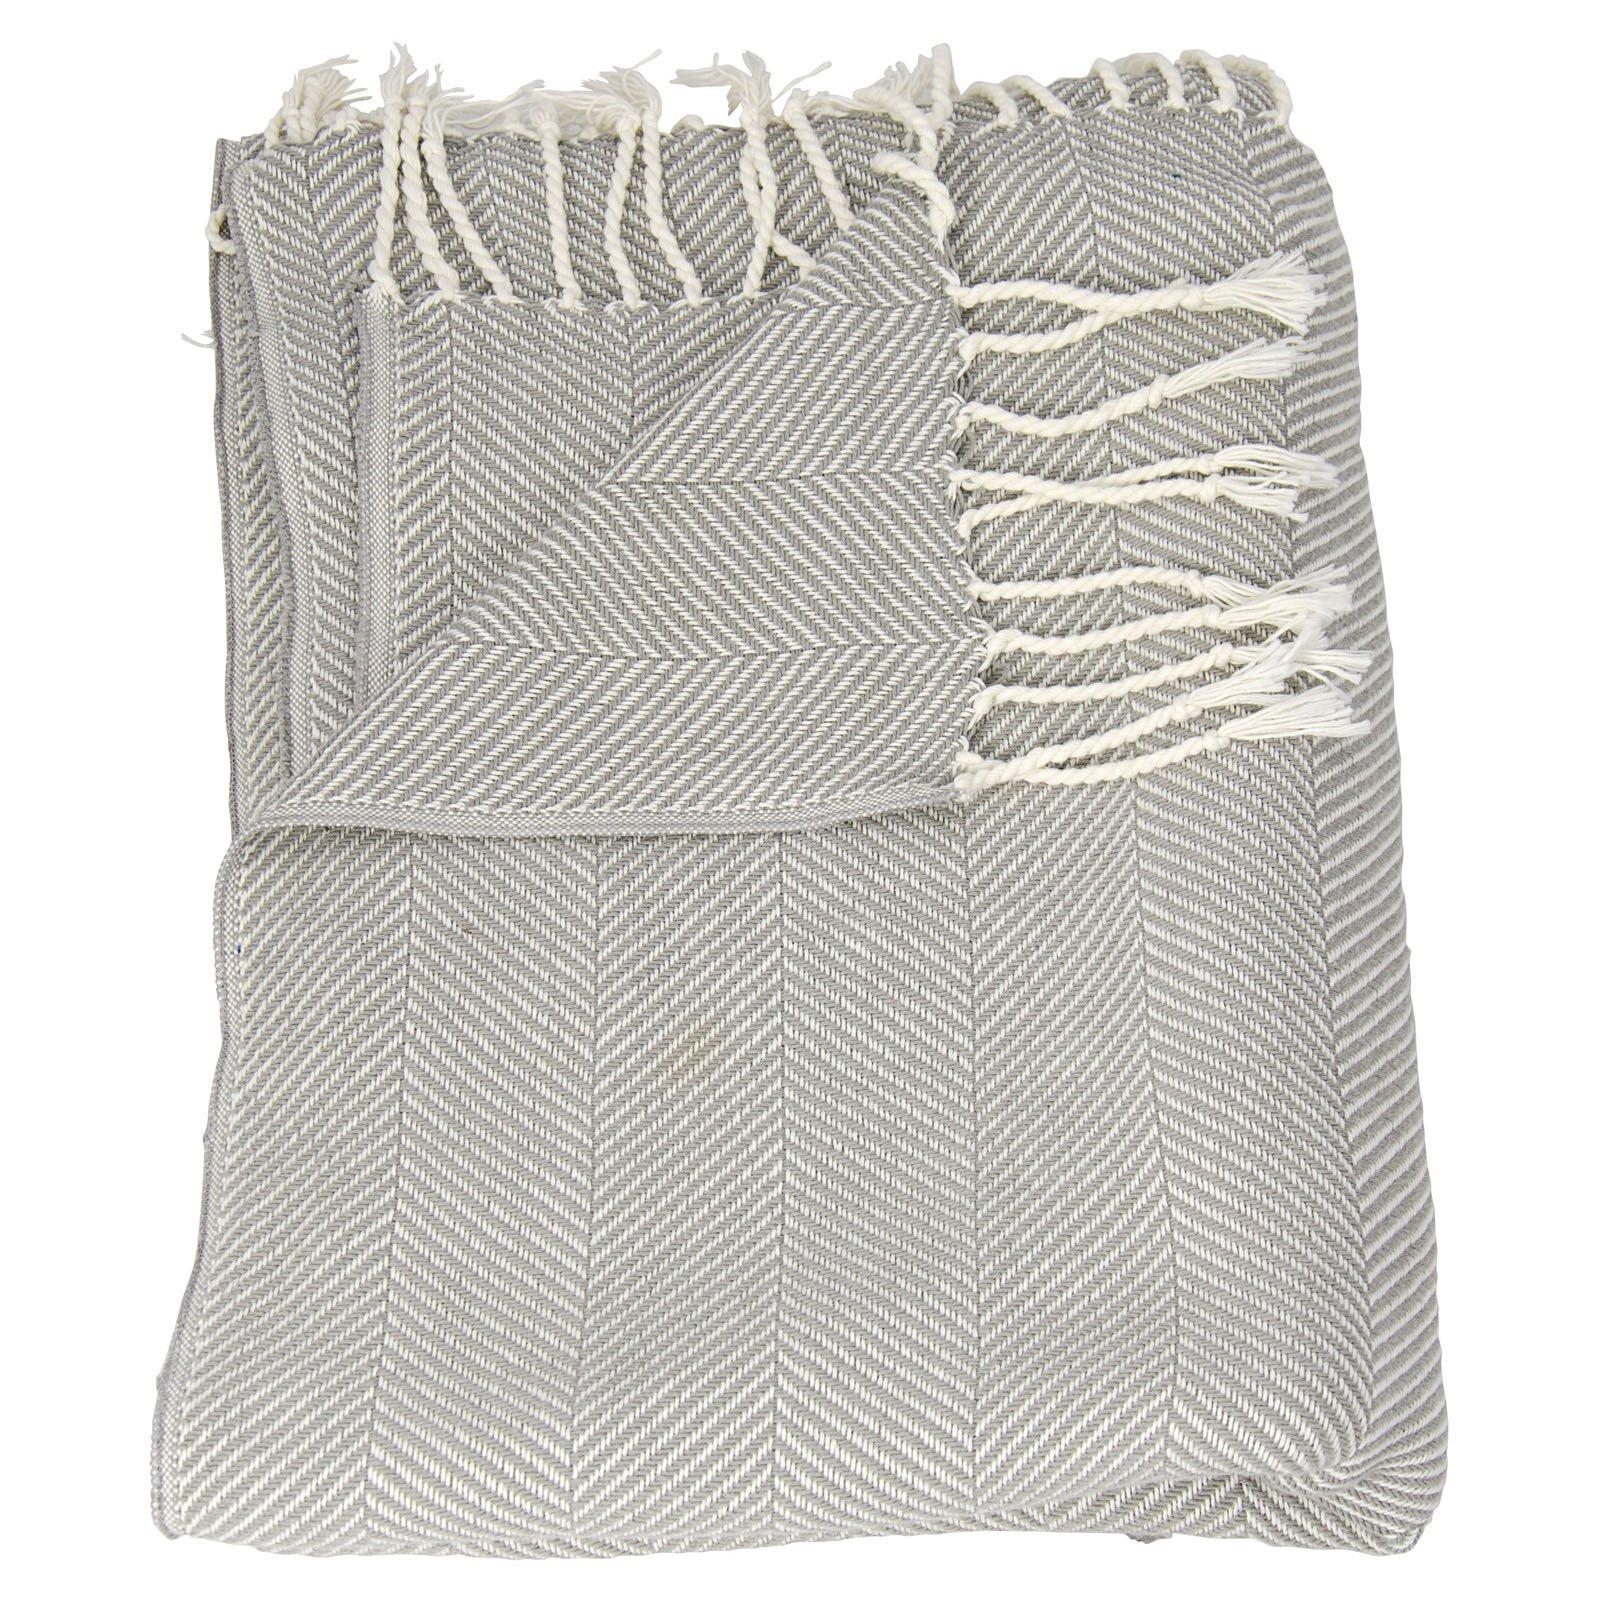 "Nourison Organic Cotton Throw Blanket, 50"" x 70"", Purple"